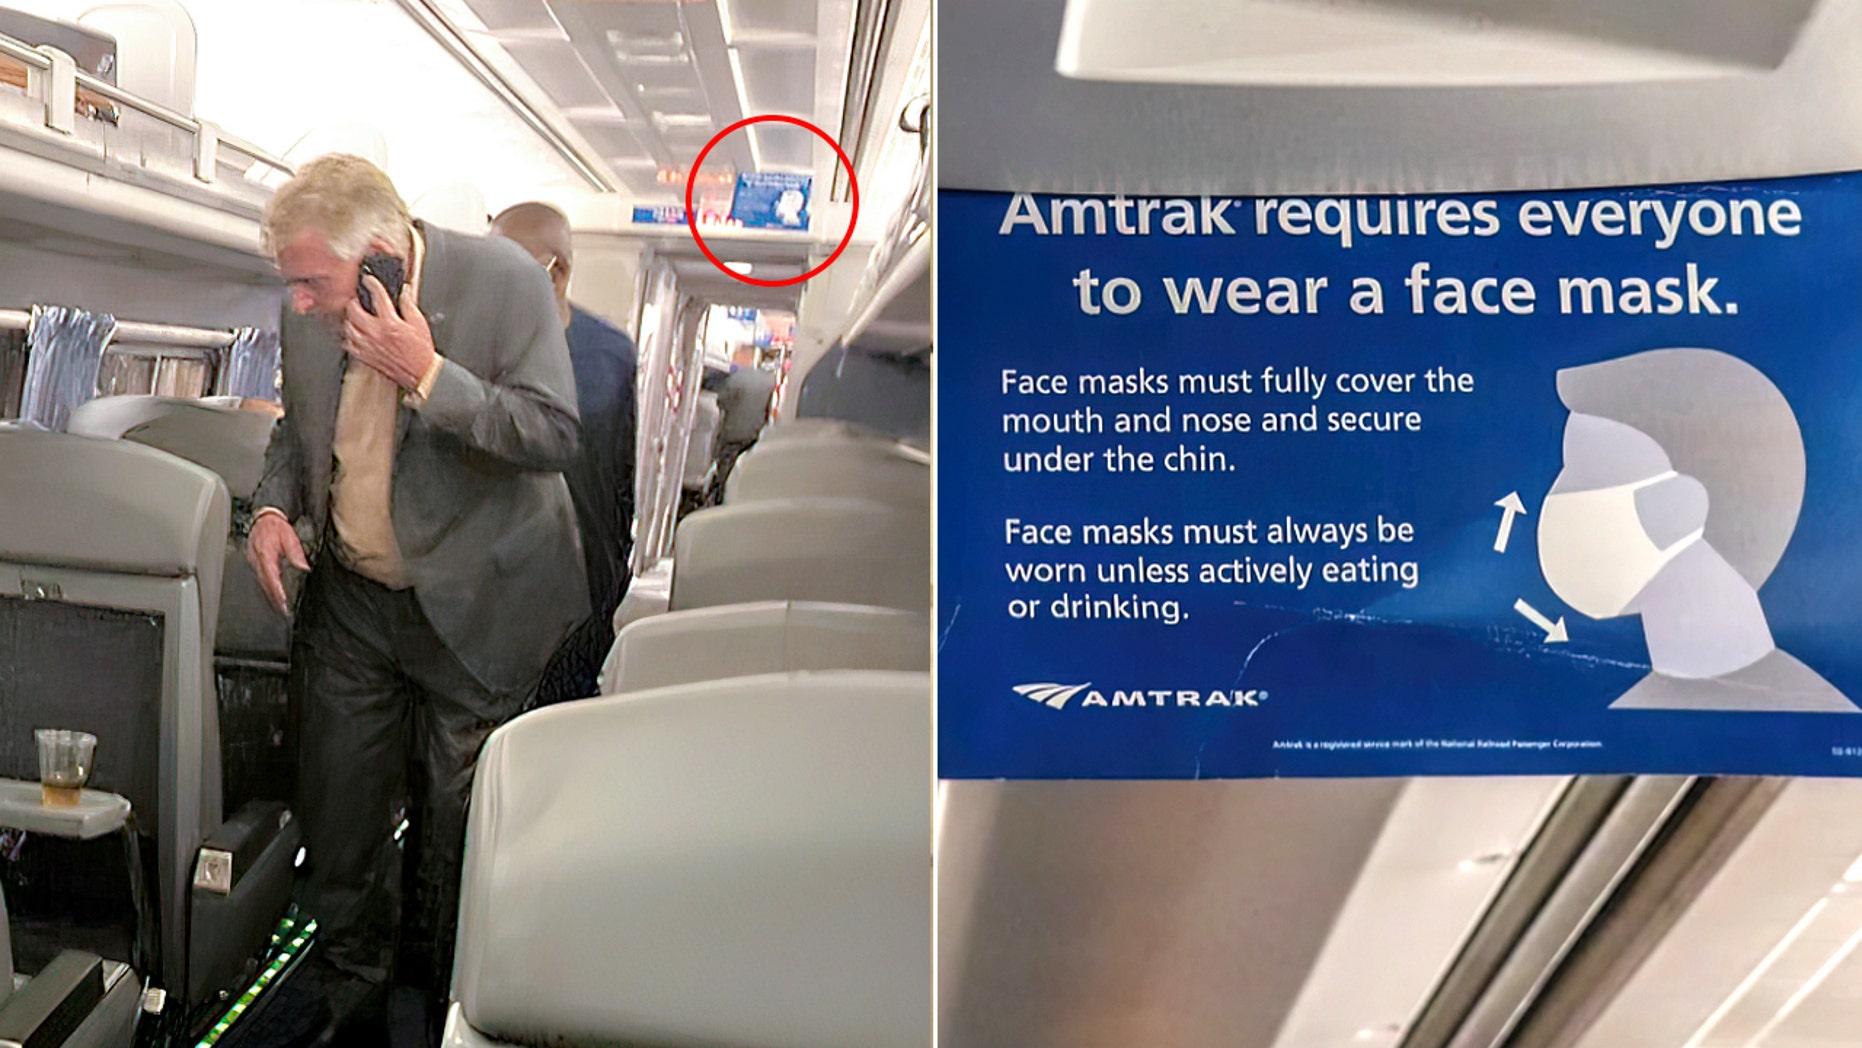 Terry-McAuliffe-Amtrak.jpg?ve=1&tl=1